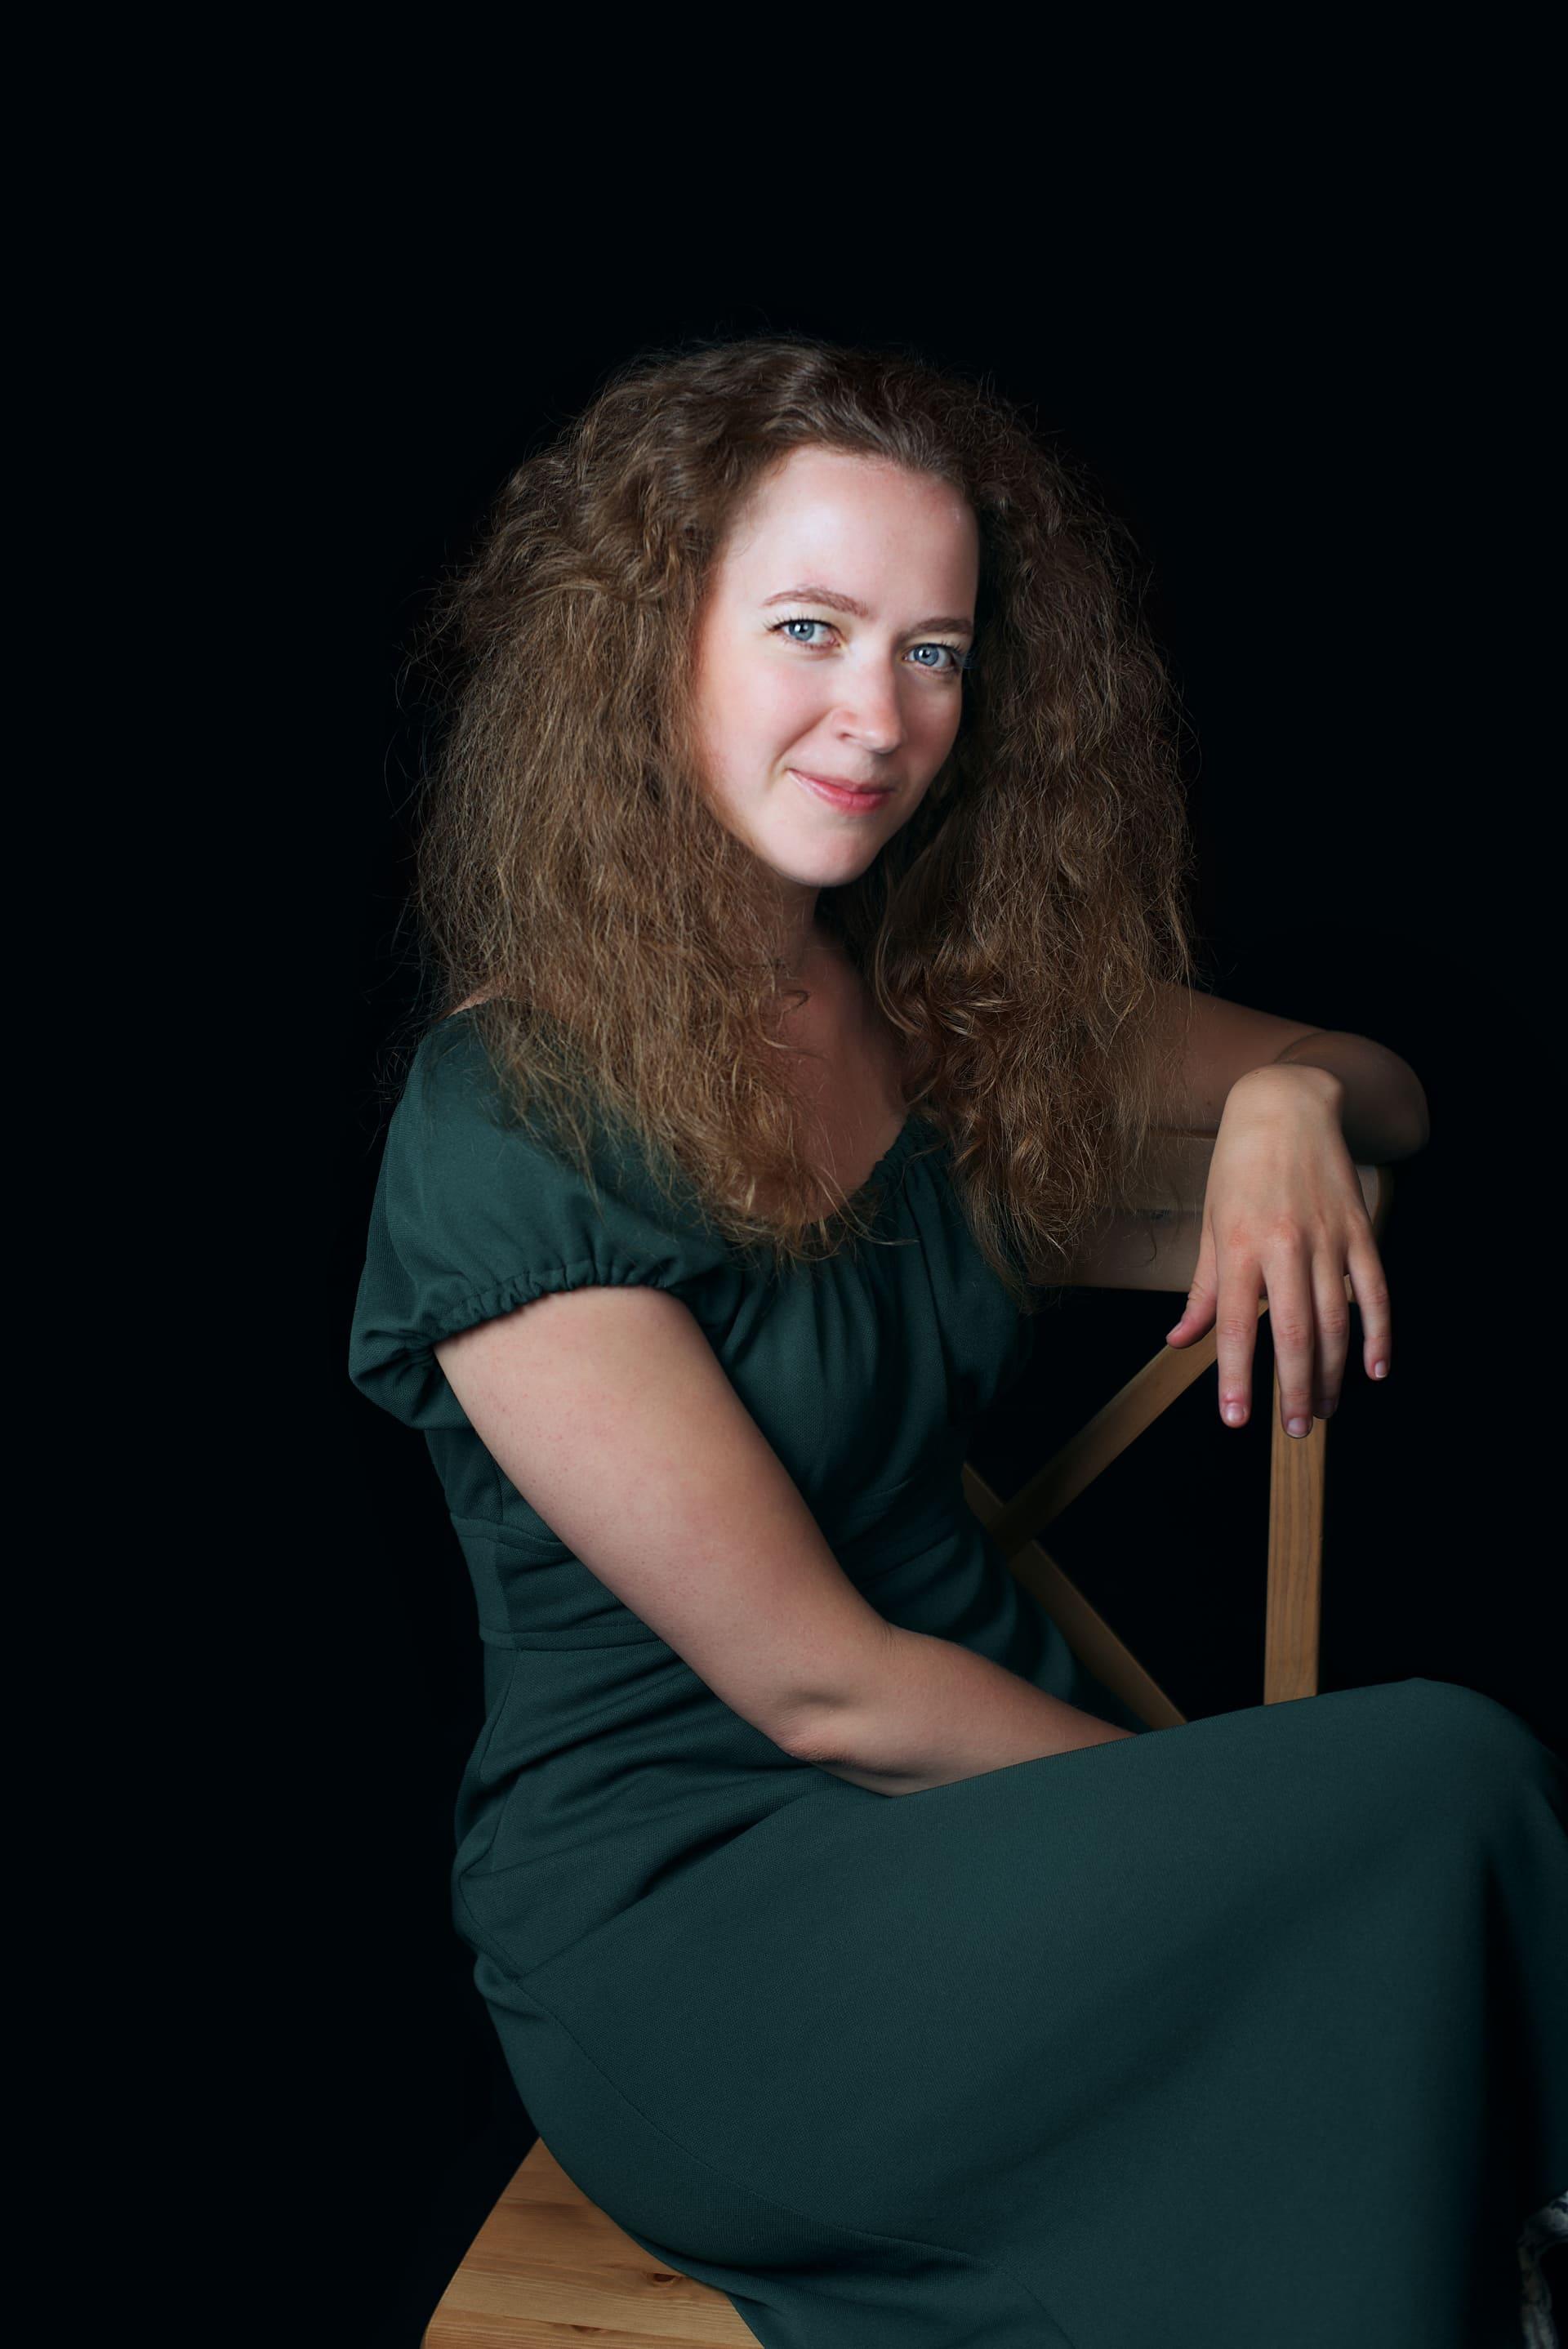 Jessica Elevant 3 kompr. web - photo by Helgi Reynisson